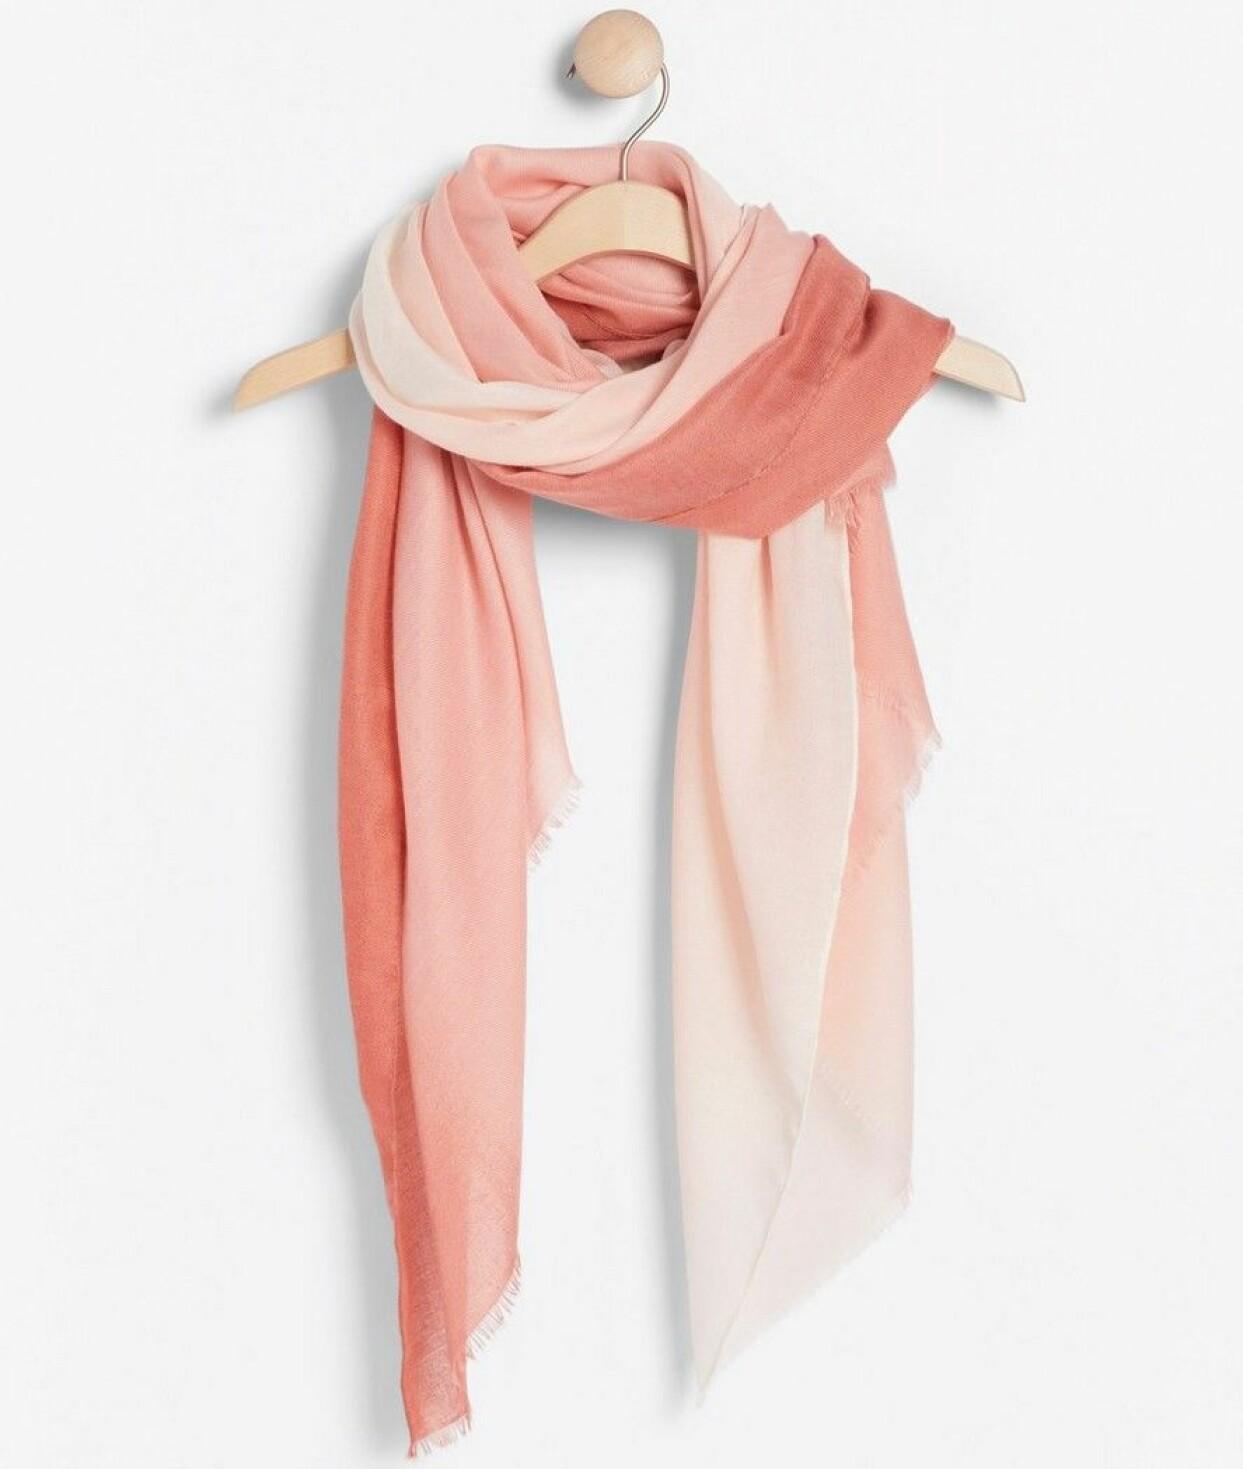 Flerfärgad sjal från Lindex